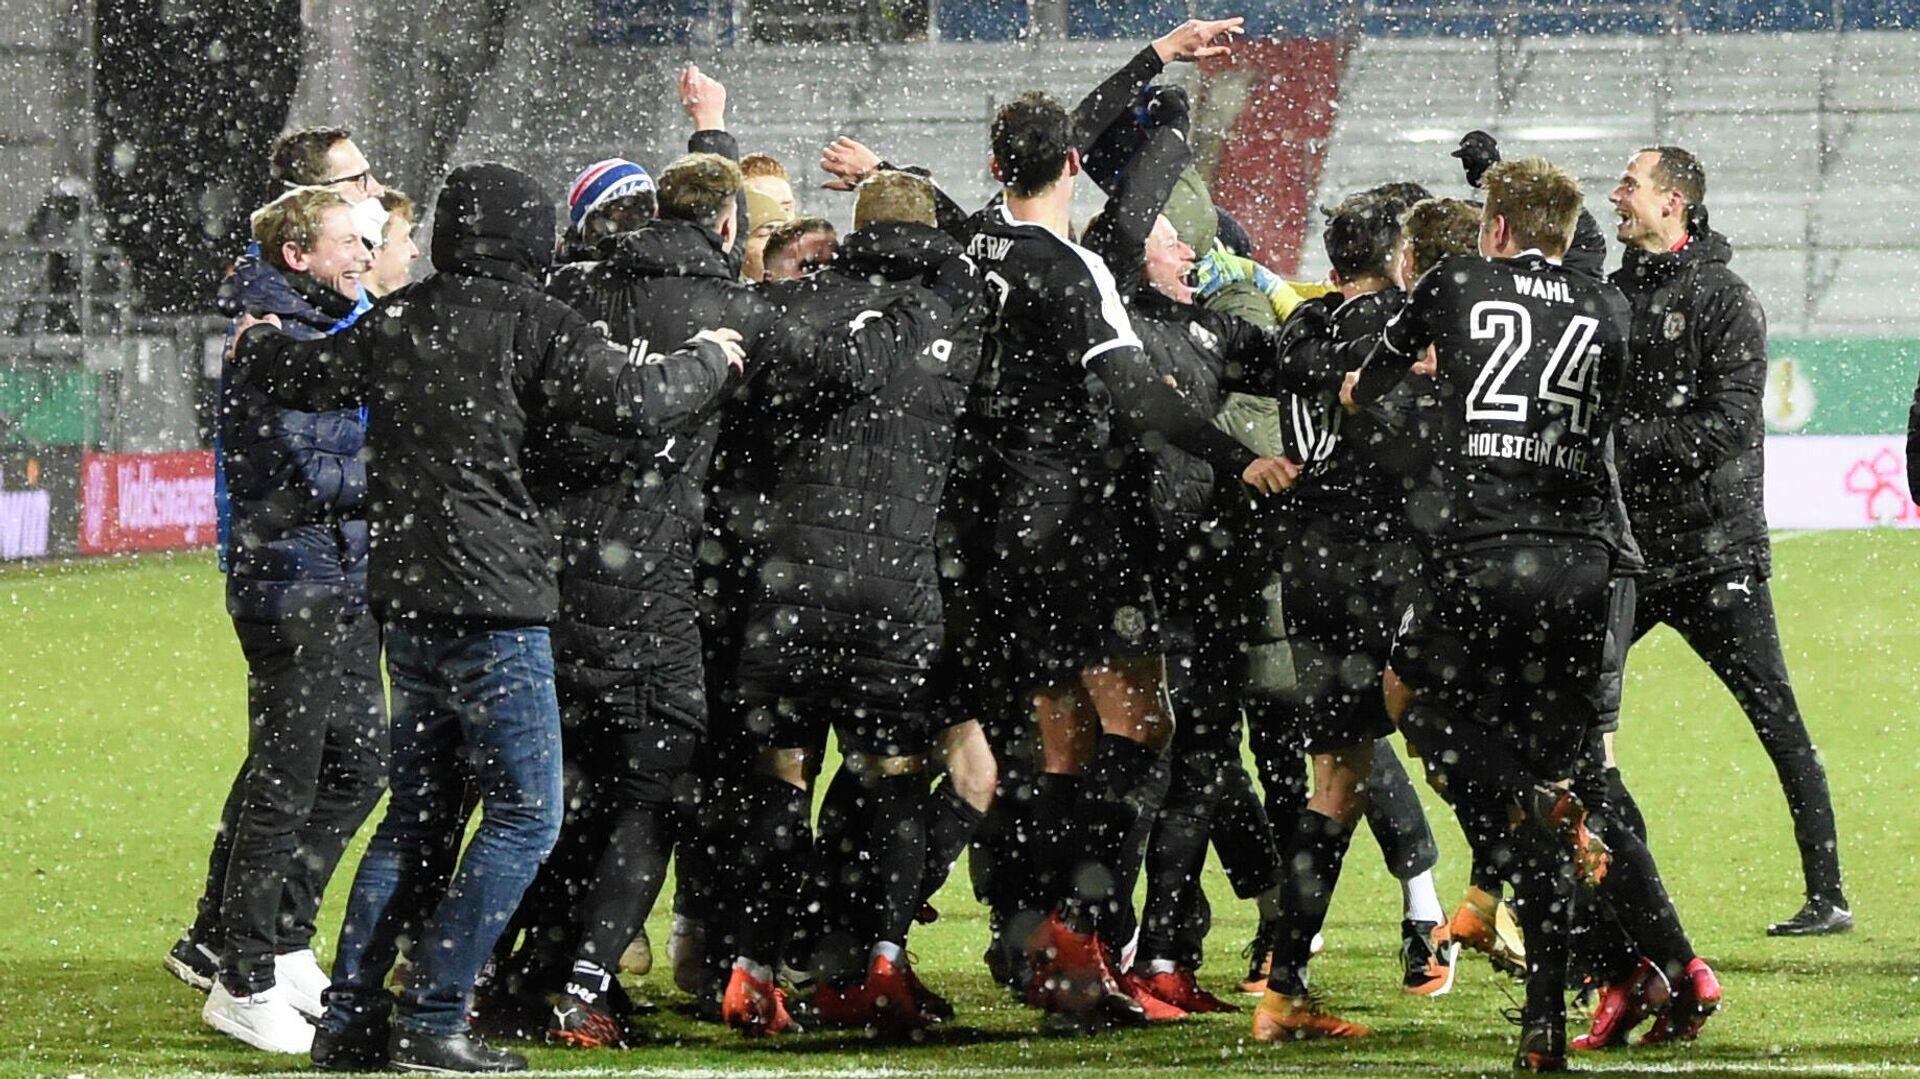 Holstein Kiel feiert Sieg gegen FC Bayern  - SNA, 1920, 14.01.2021